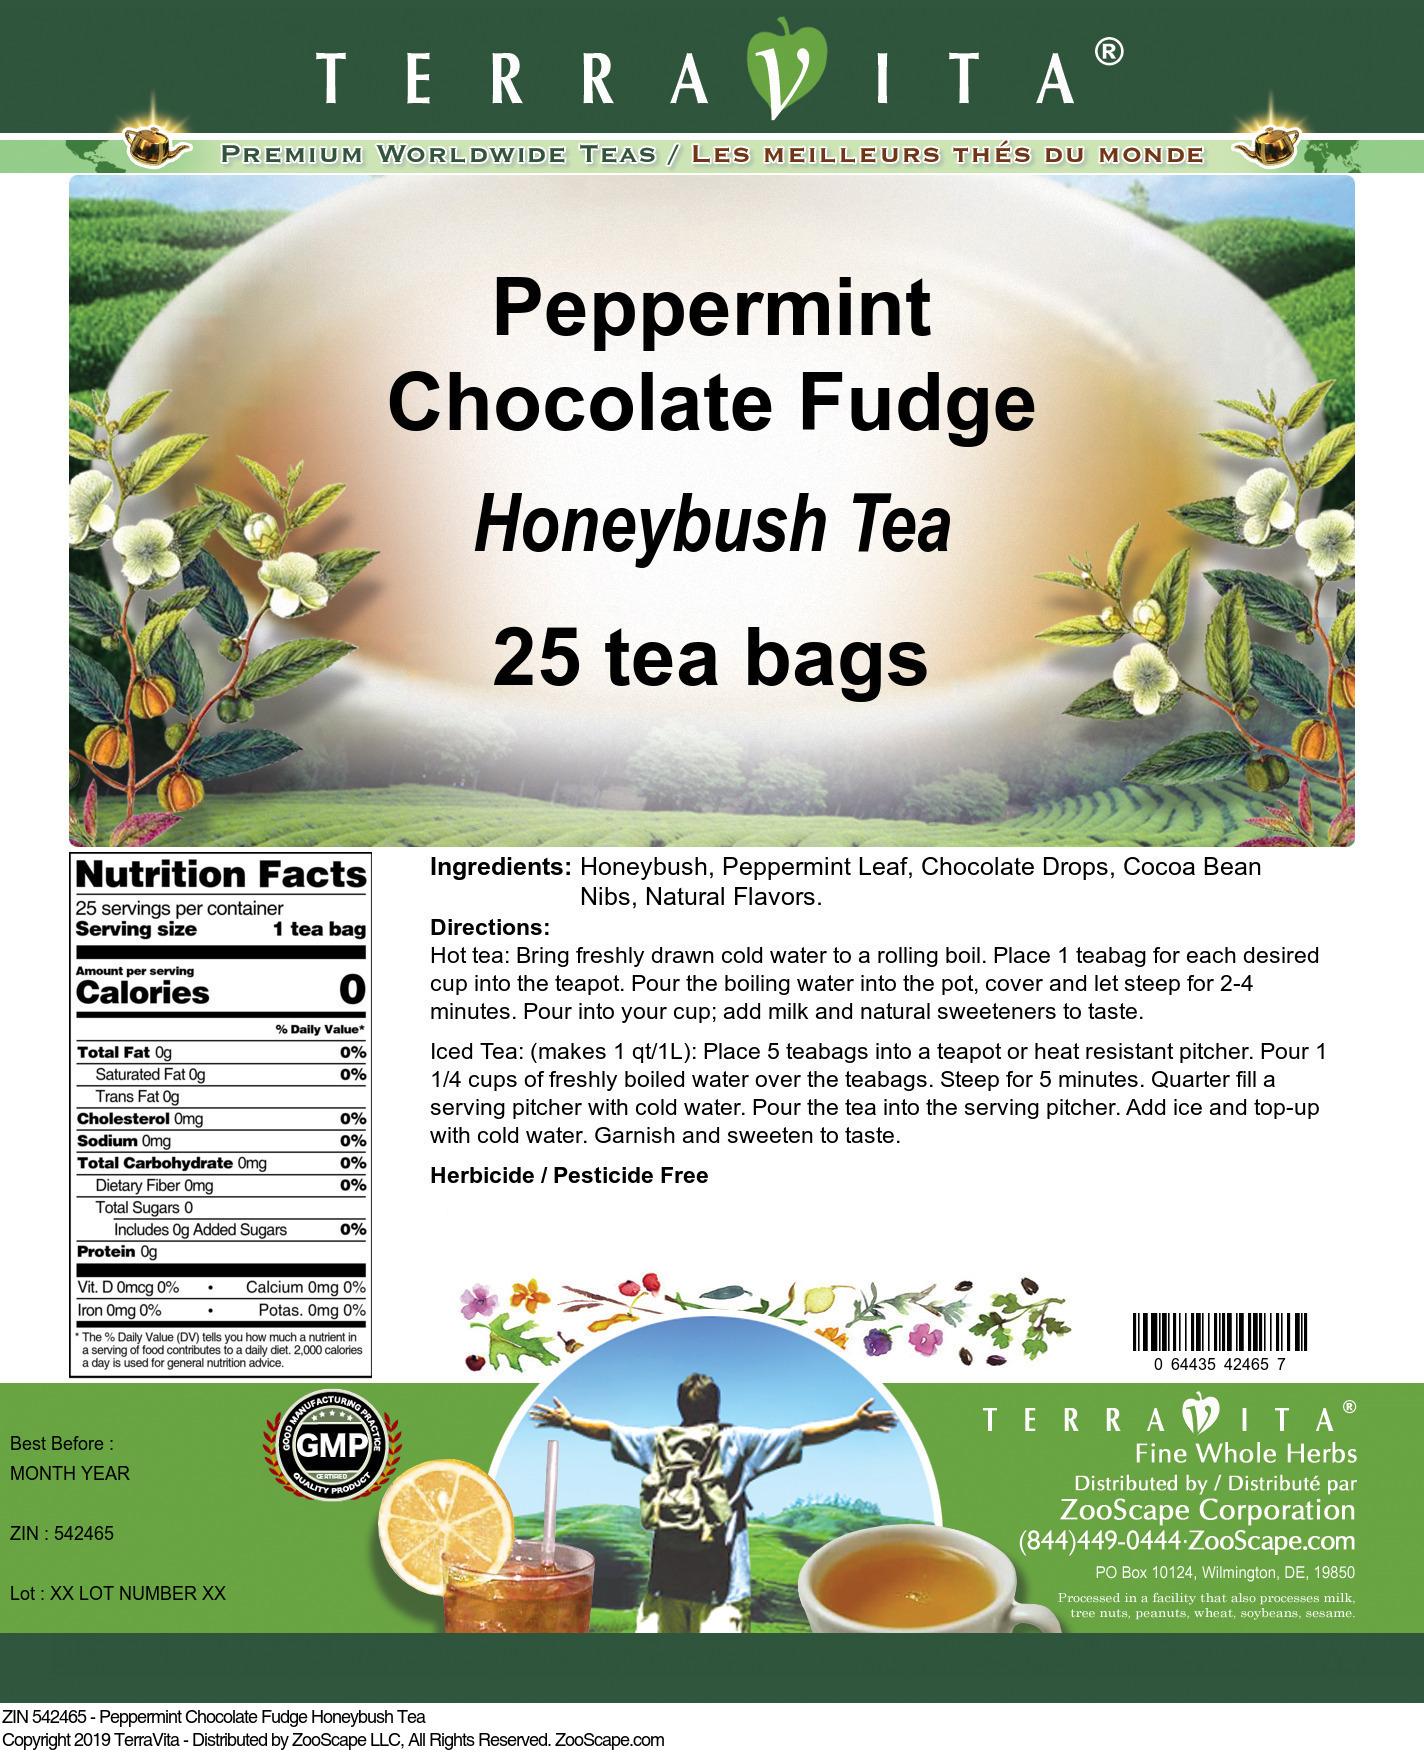 Peppermint Chocolate Fudge Honeybush Tea